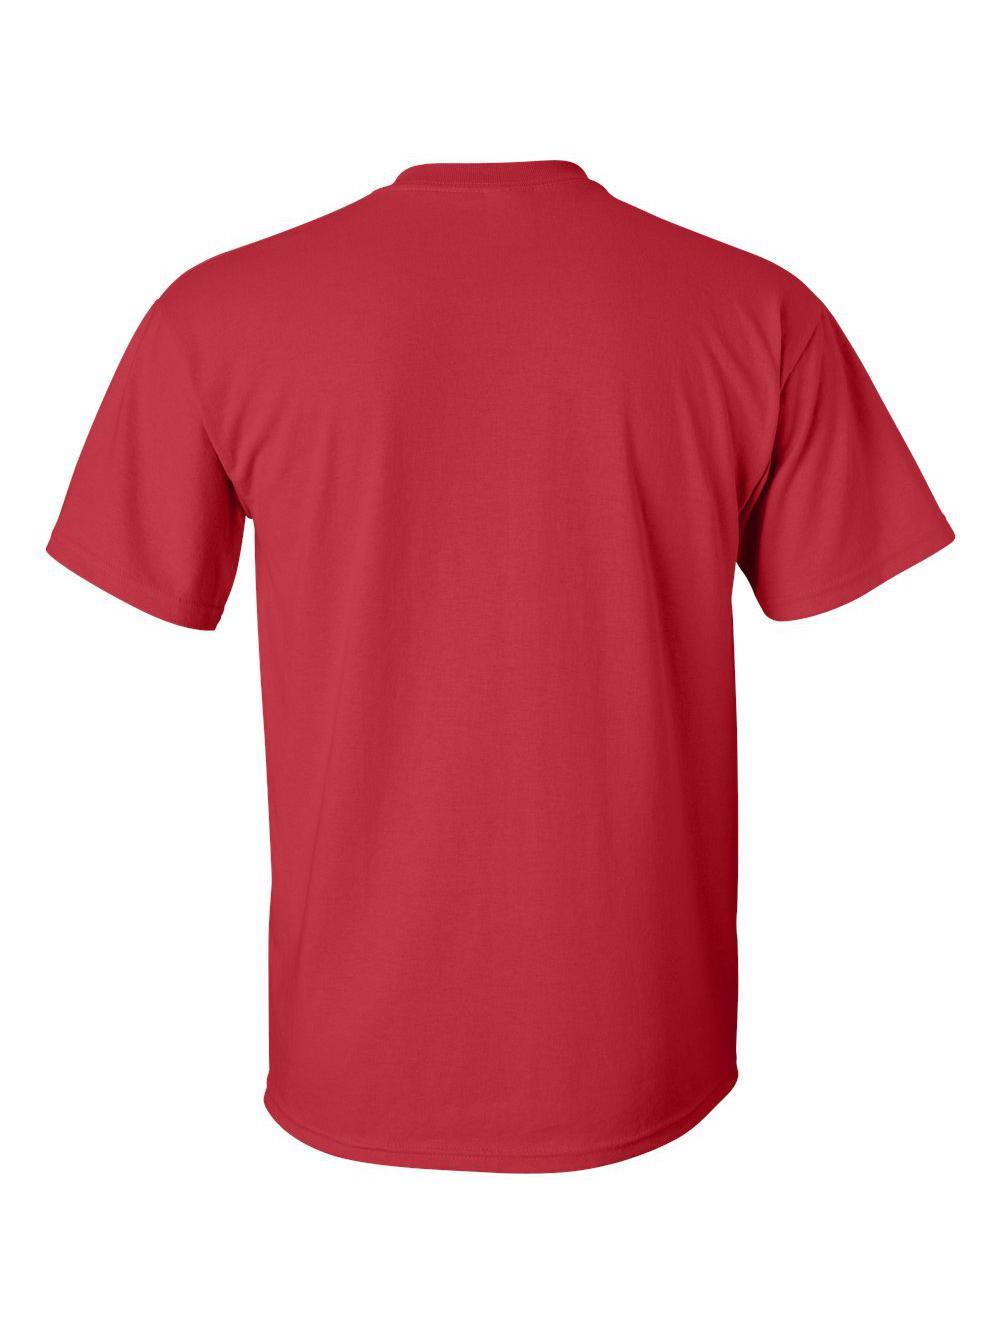 Gildan-Ultra-Cotton-T-Shirt-Tall-Sizes-2000T thumbnail 13